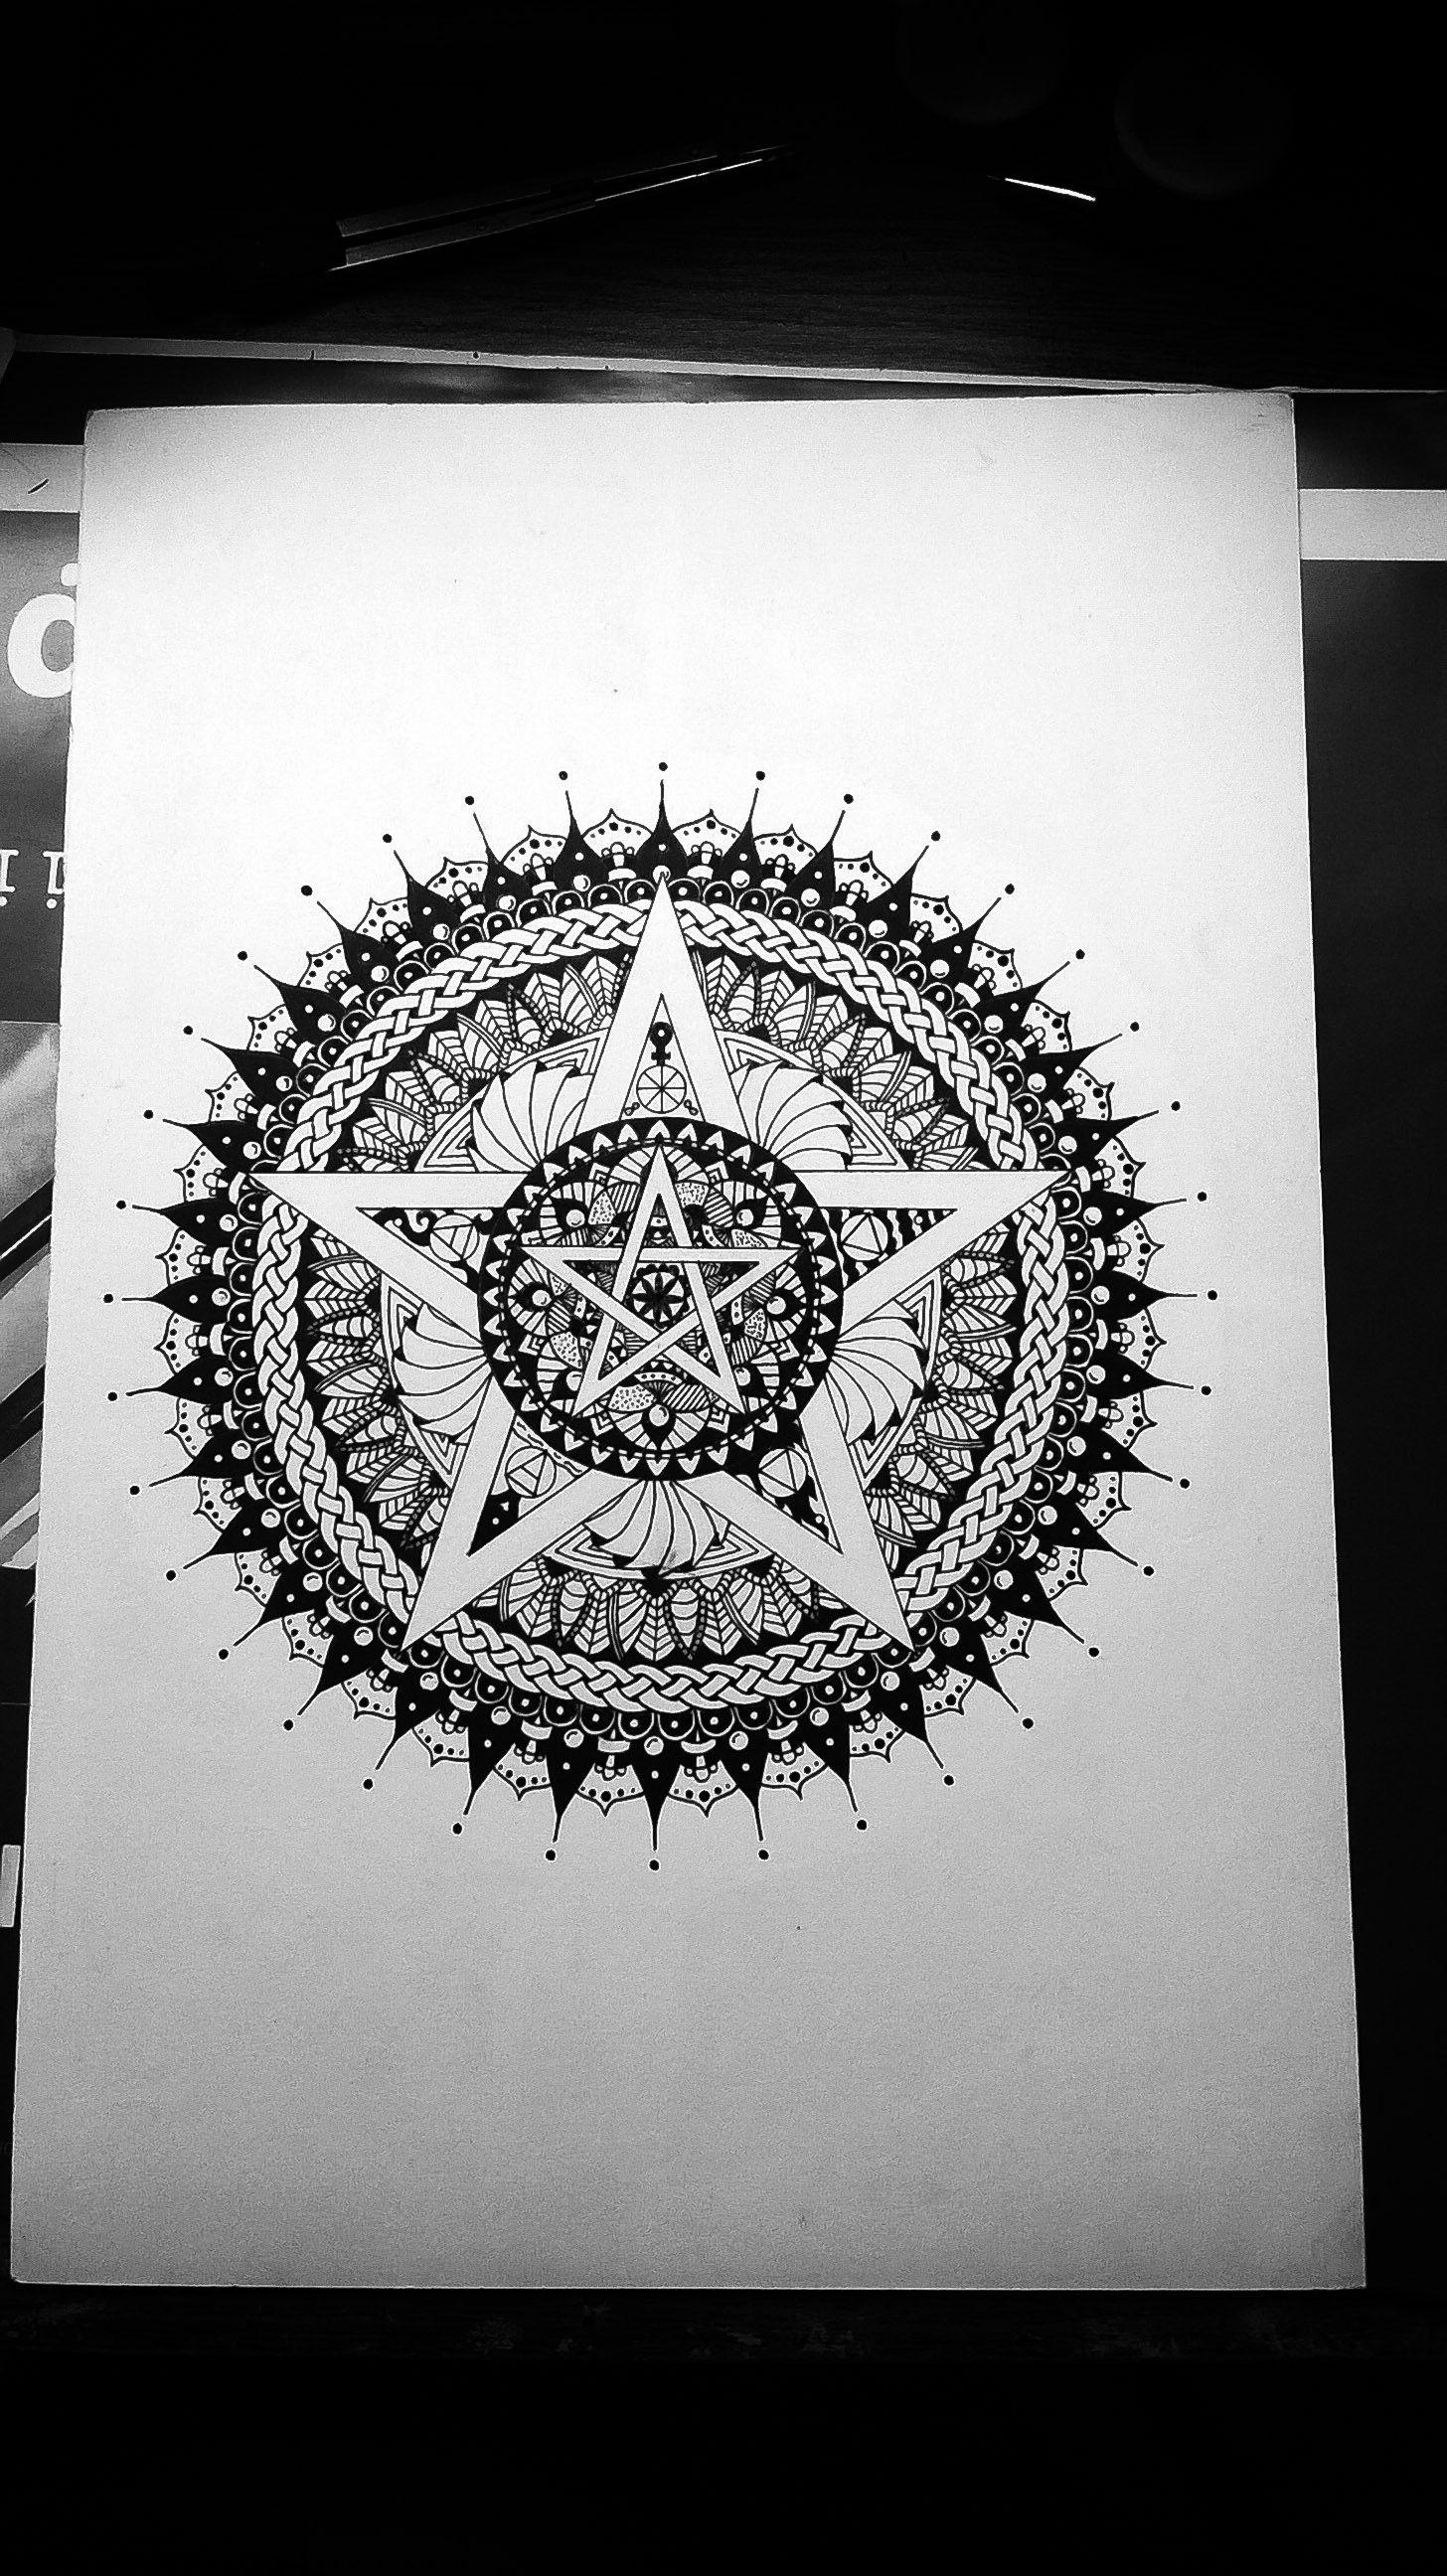 Pentacle mandala for protection mandala my mandalas pinterest tattoo ideen und ideen - Symbole protection tatouage ...